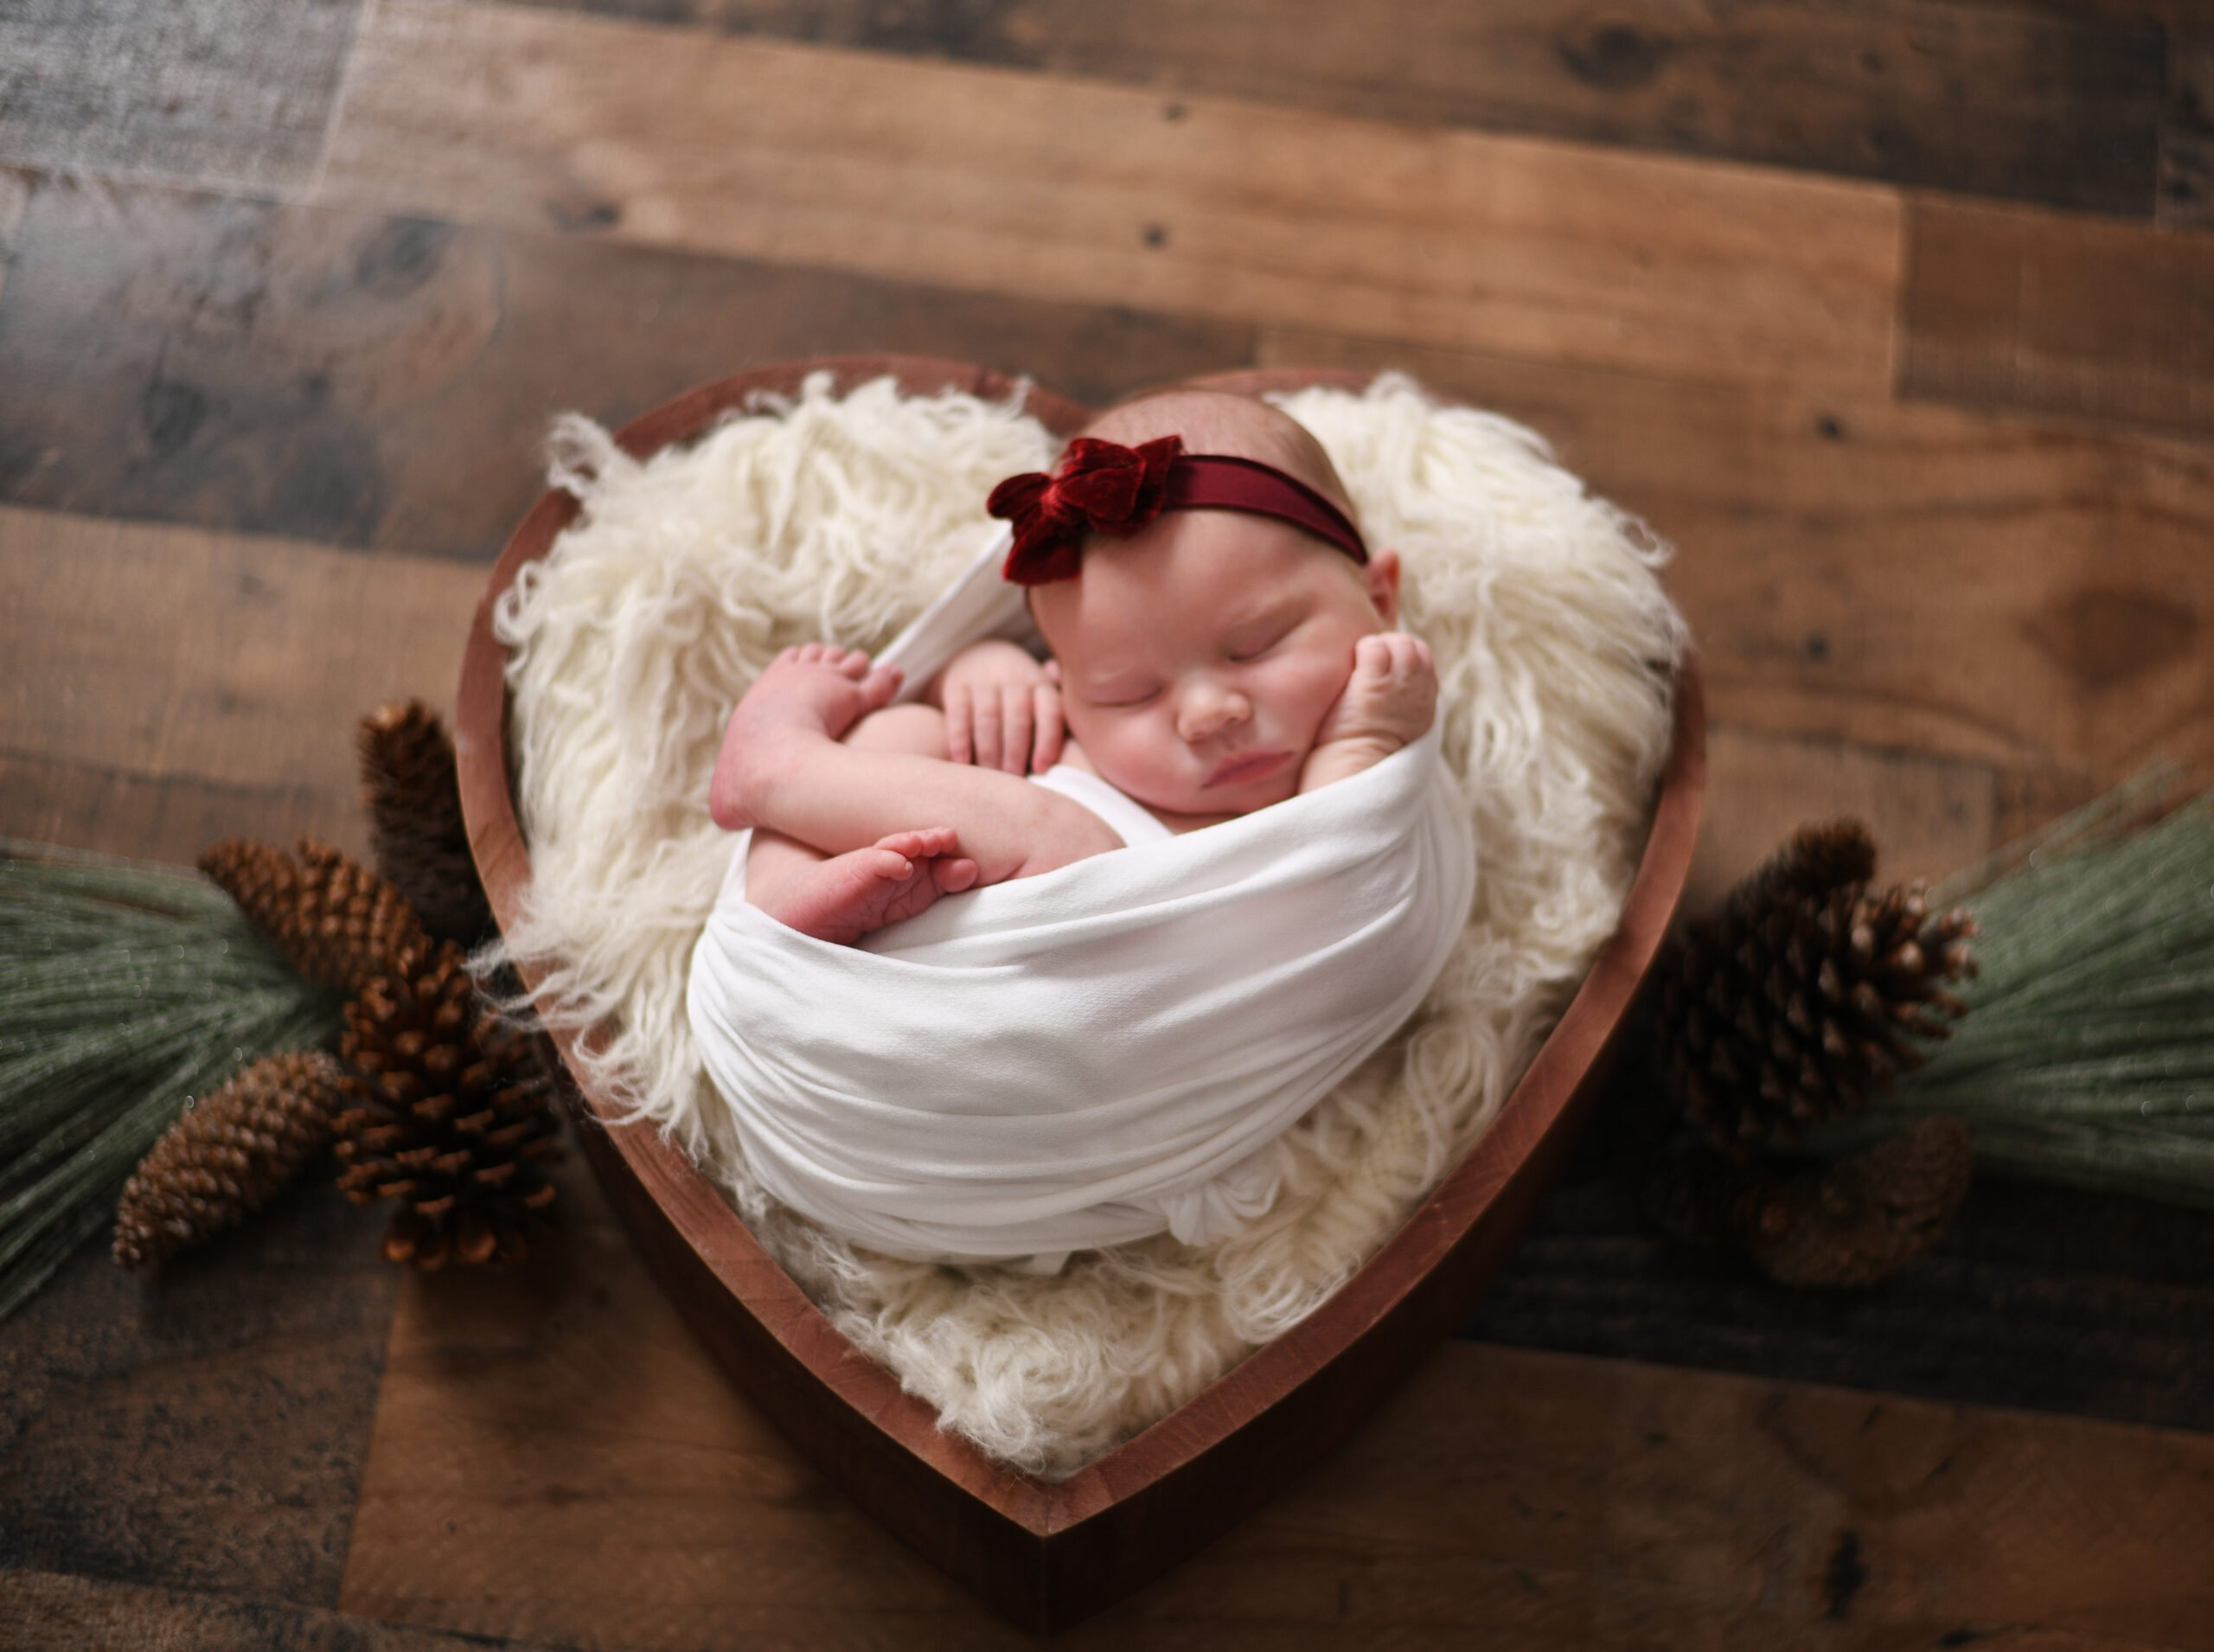 Newborn photo taken by Lisa Rowland Photography in Trenton, Florida